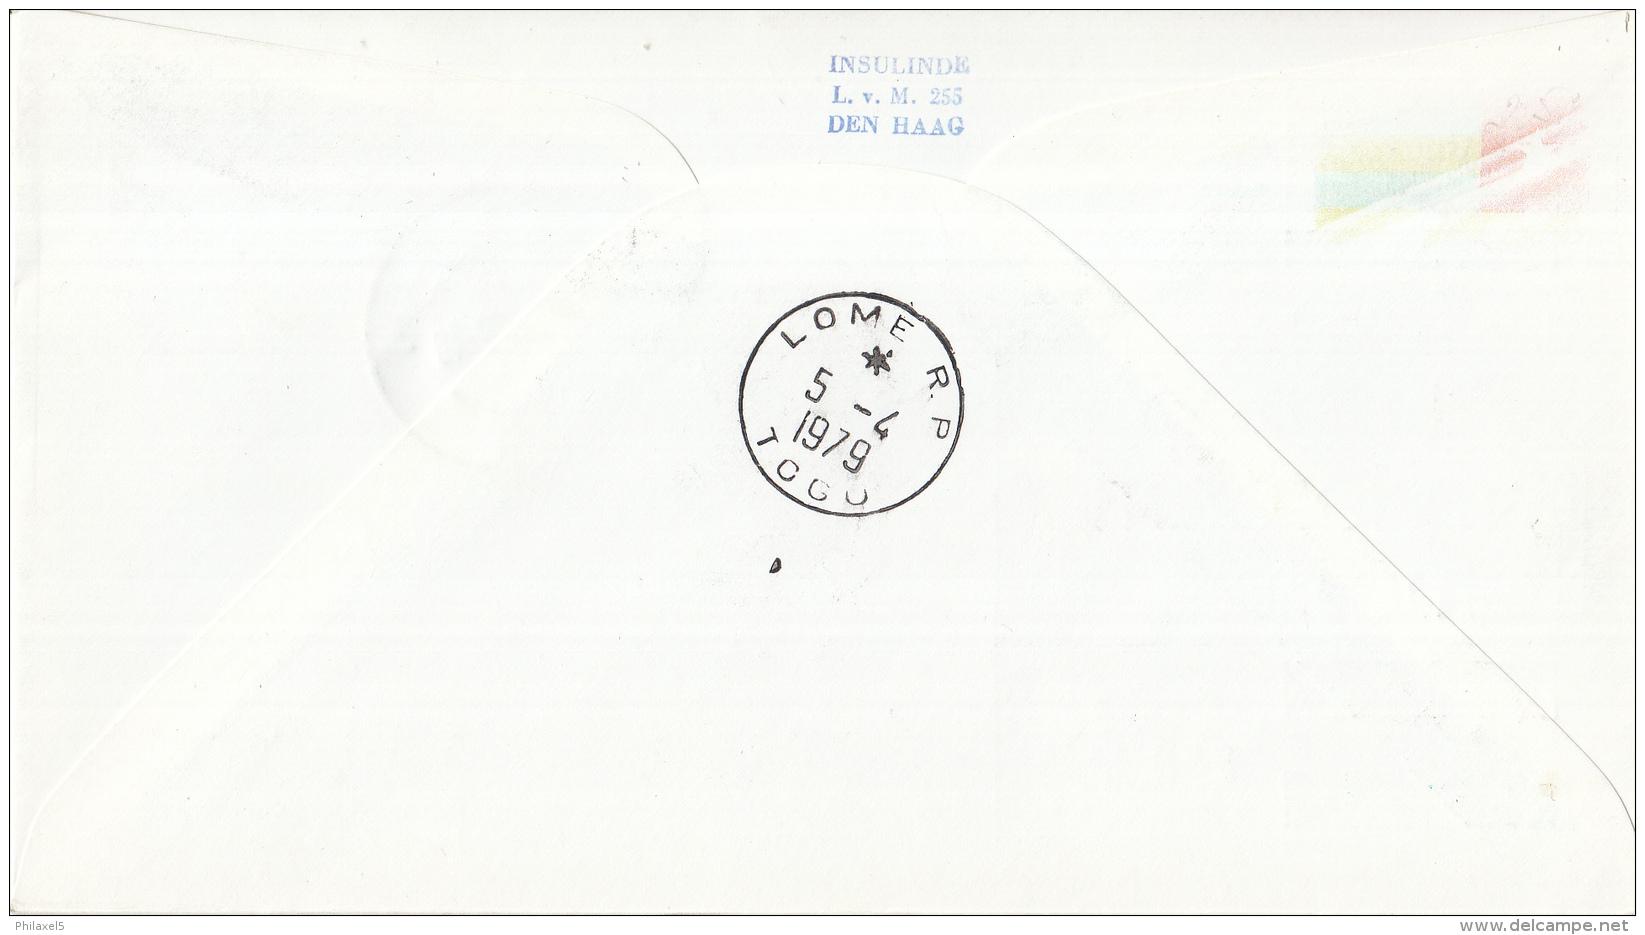 Nederland - 1ste Vlucht - 4 April 1979 - Amsterdam-Lomé - Vl. Hol. 978a - Marcofilie - EMA (Print Machine)